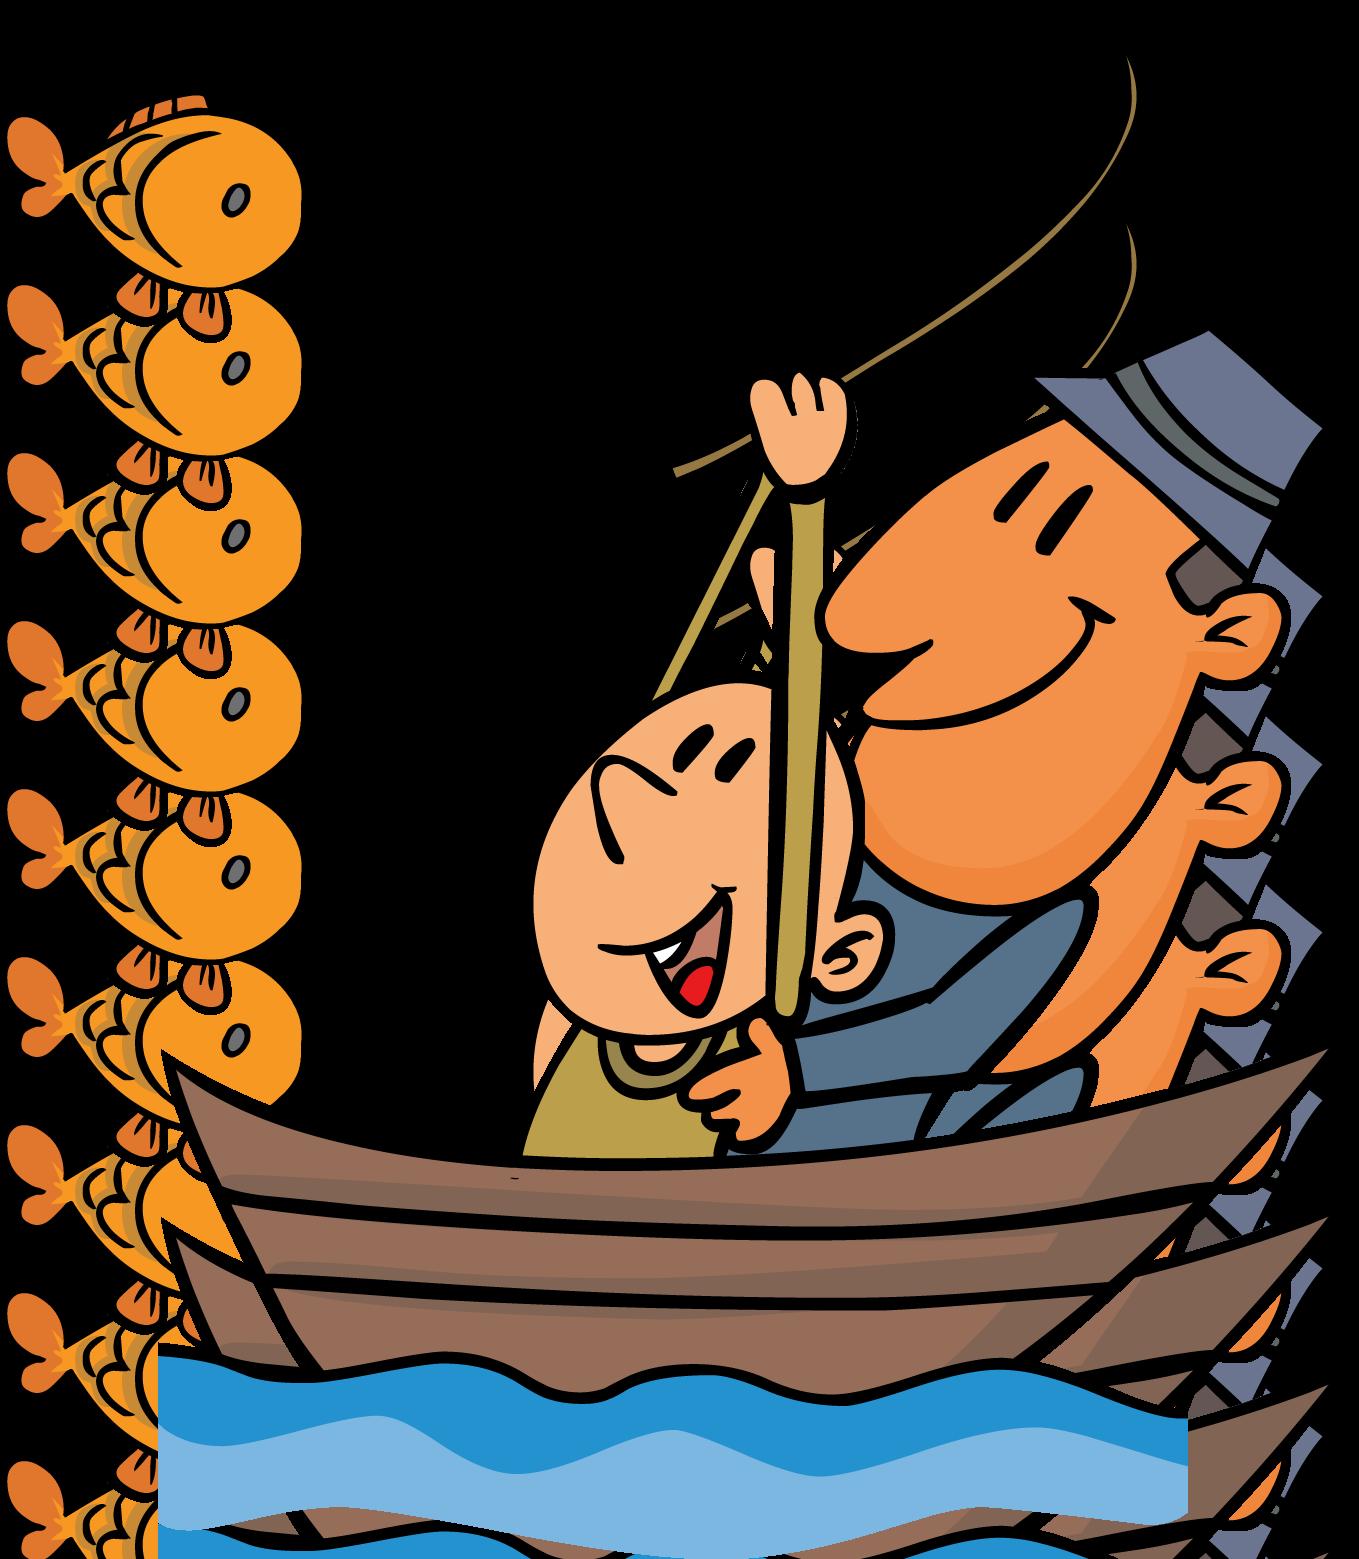 Fish basket clipart. Explore go fishing clip